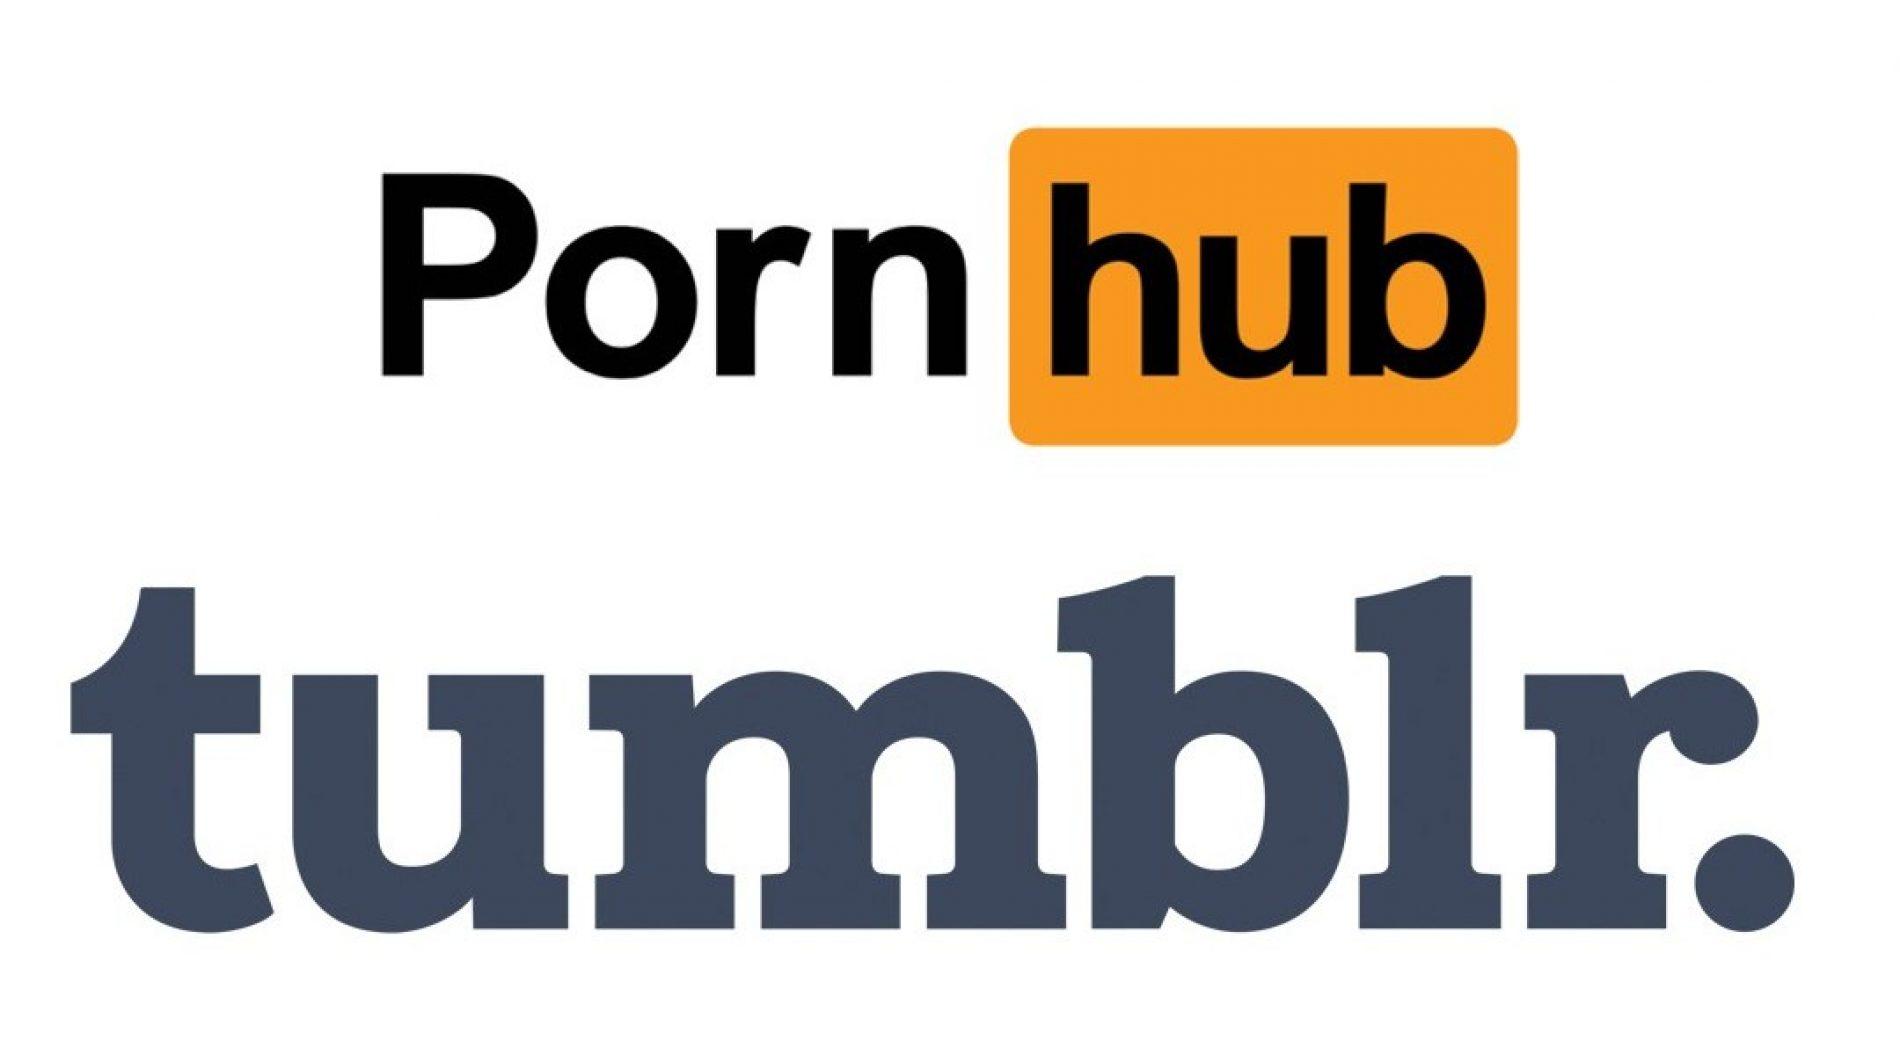 Pornhub is looking to buy Tumblr